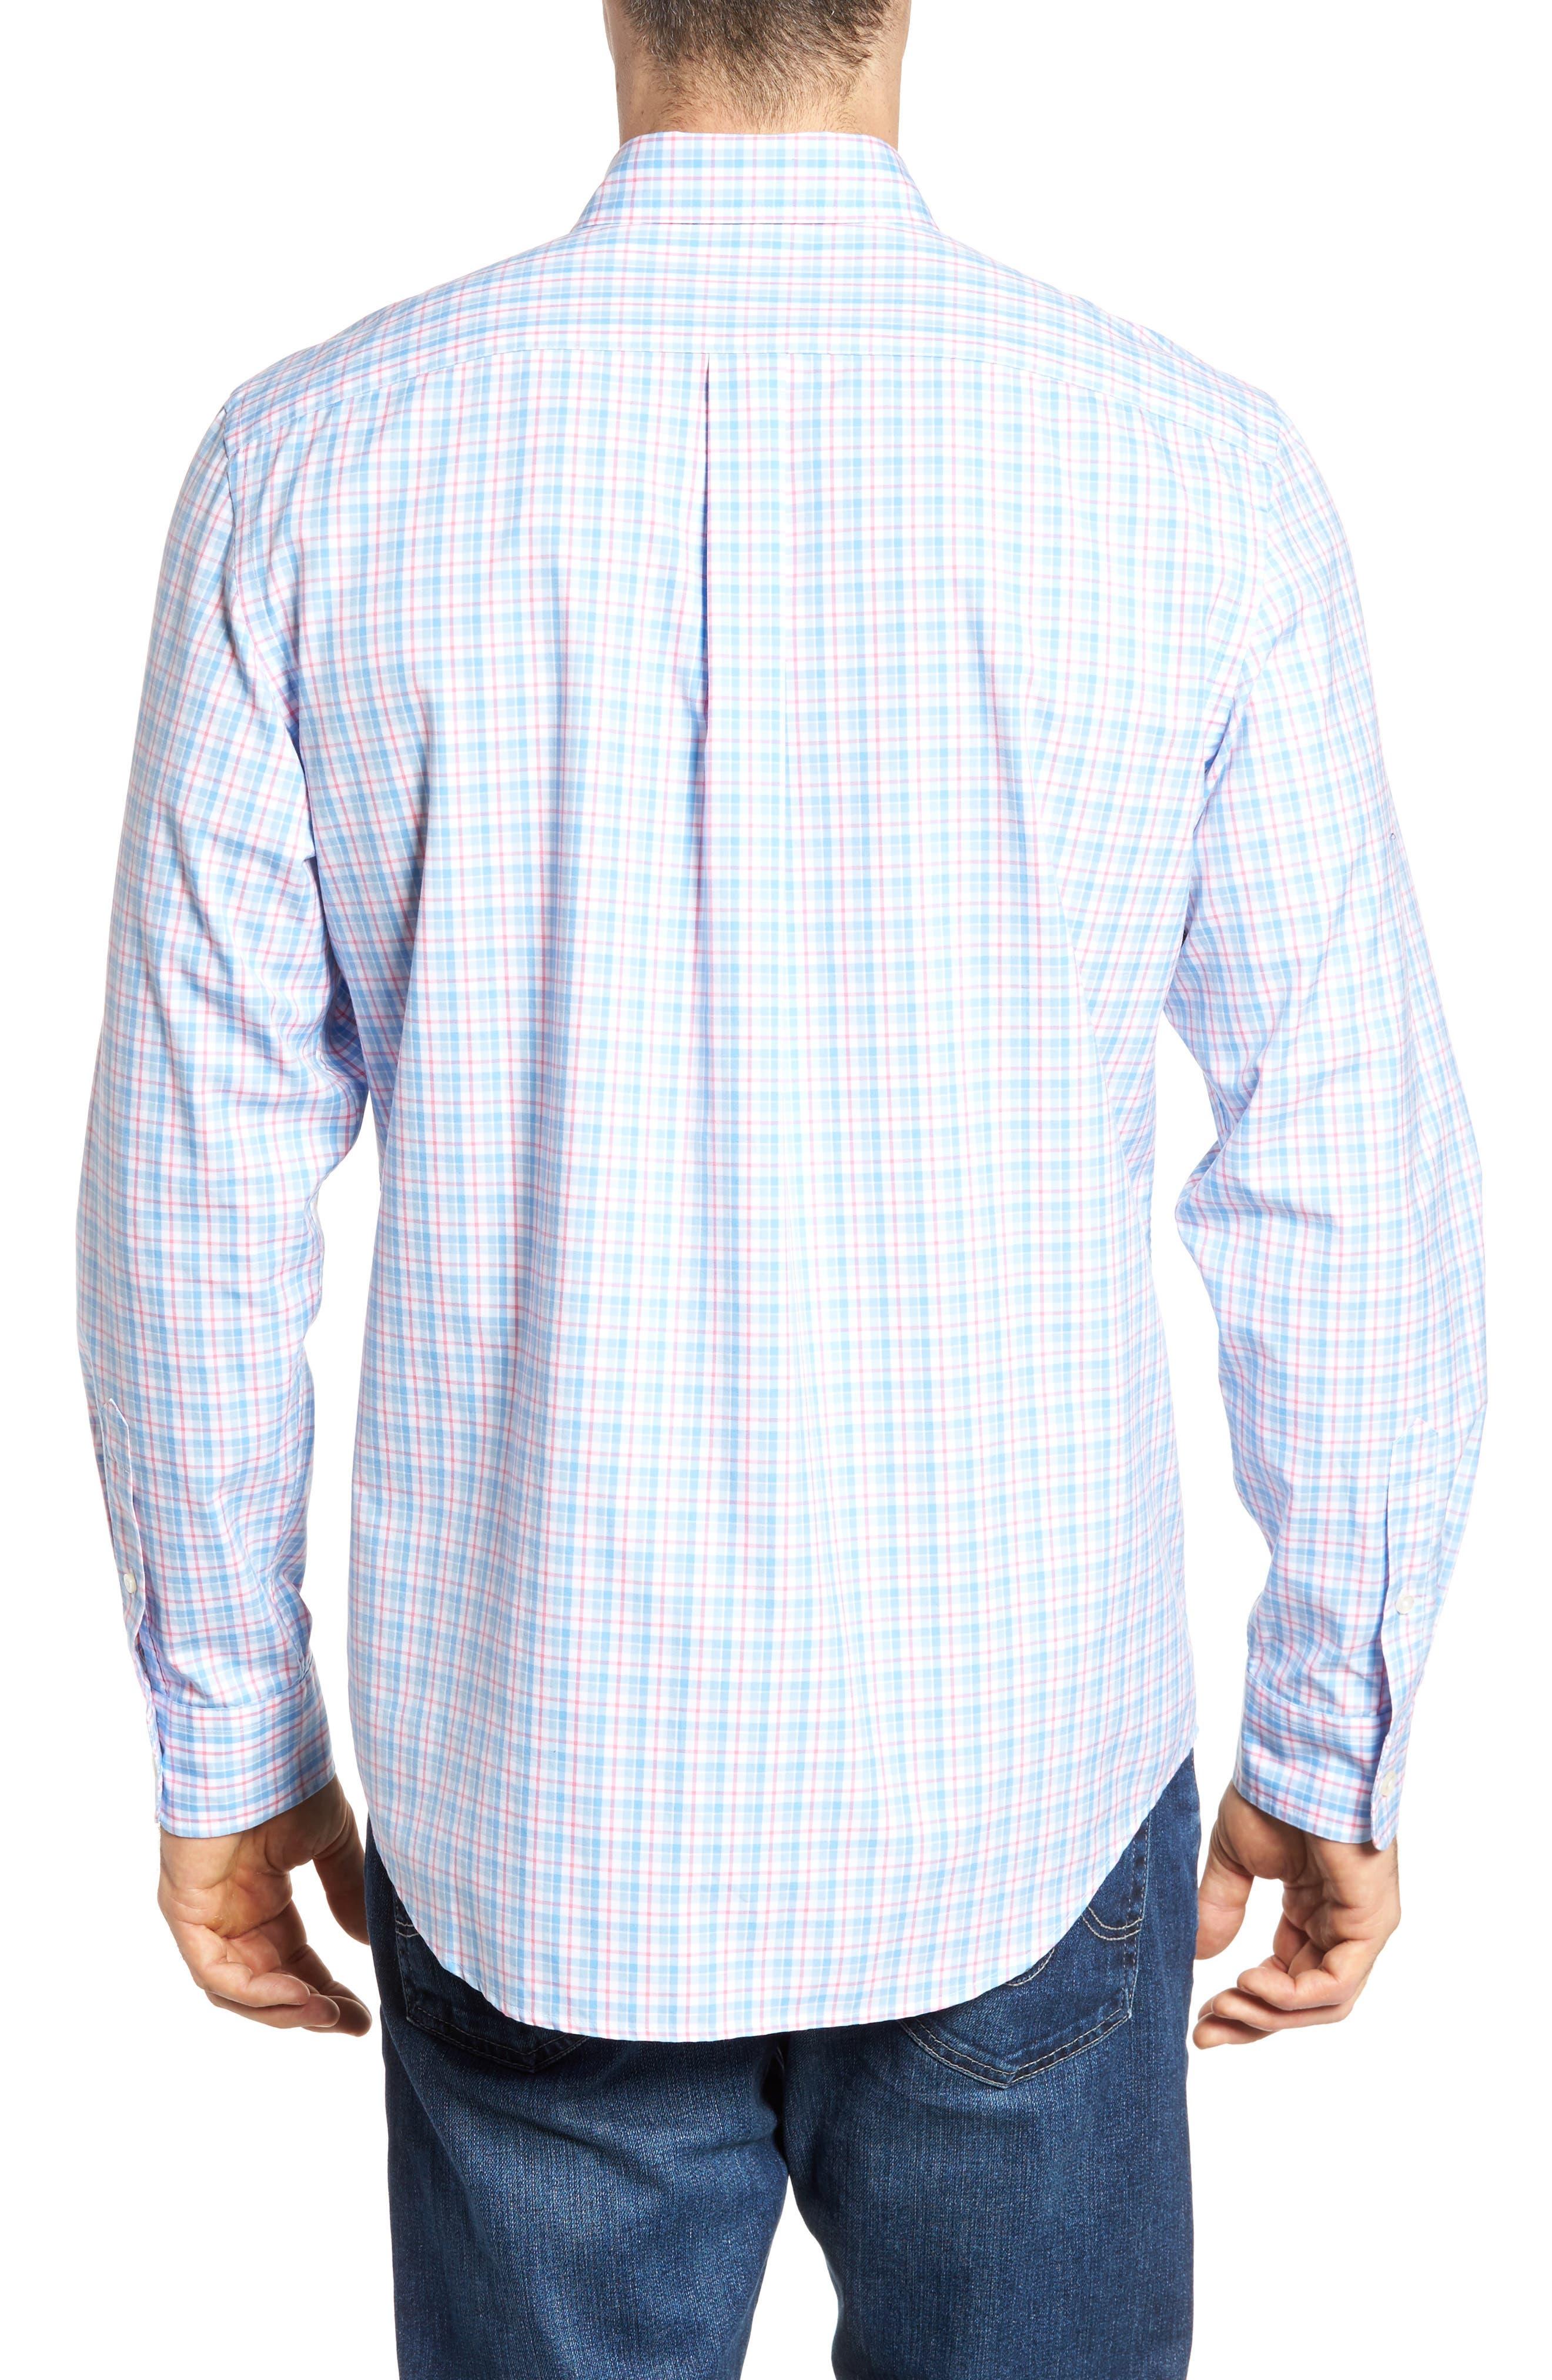 Off Island Classic Fit Plaid Sport Shirt,                             Alternate thumbnail 2, color,                             650